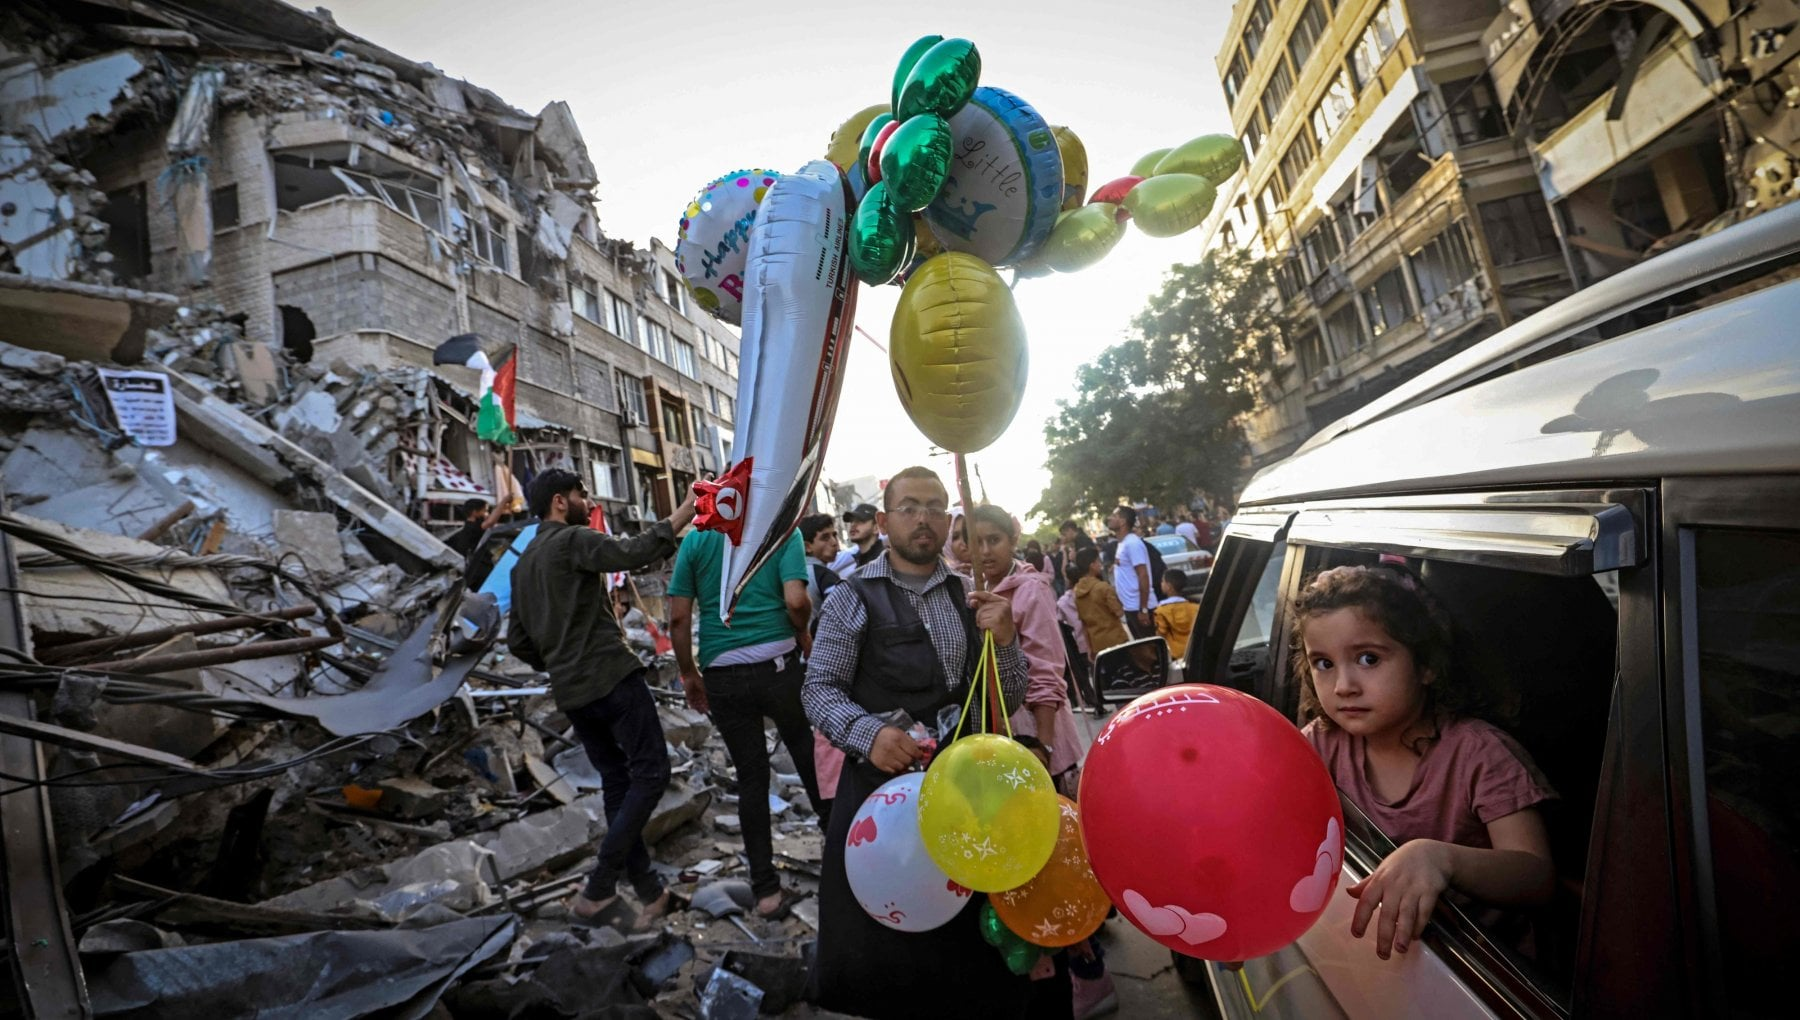 222721035 b40f524d d7cf 448b 93b0 77627e53dd39 - Nelle vie di Gaza il popolo di Hamas festeggia tra le rovine